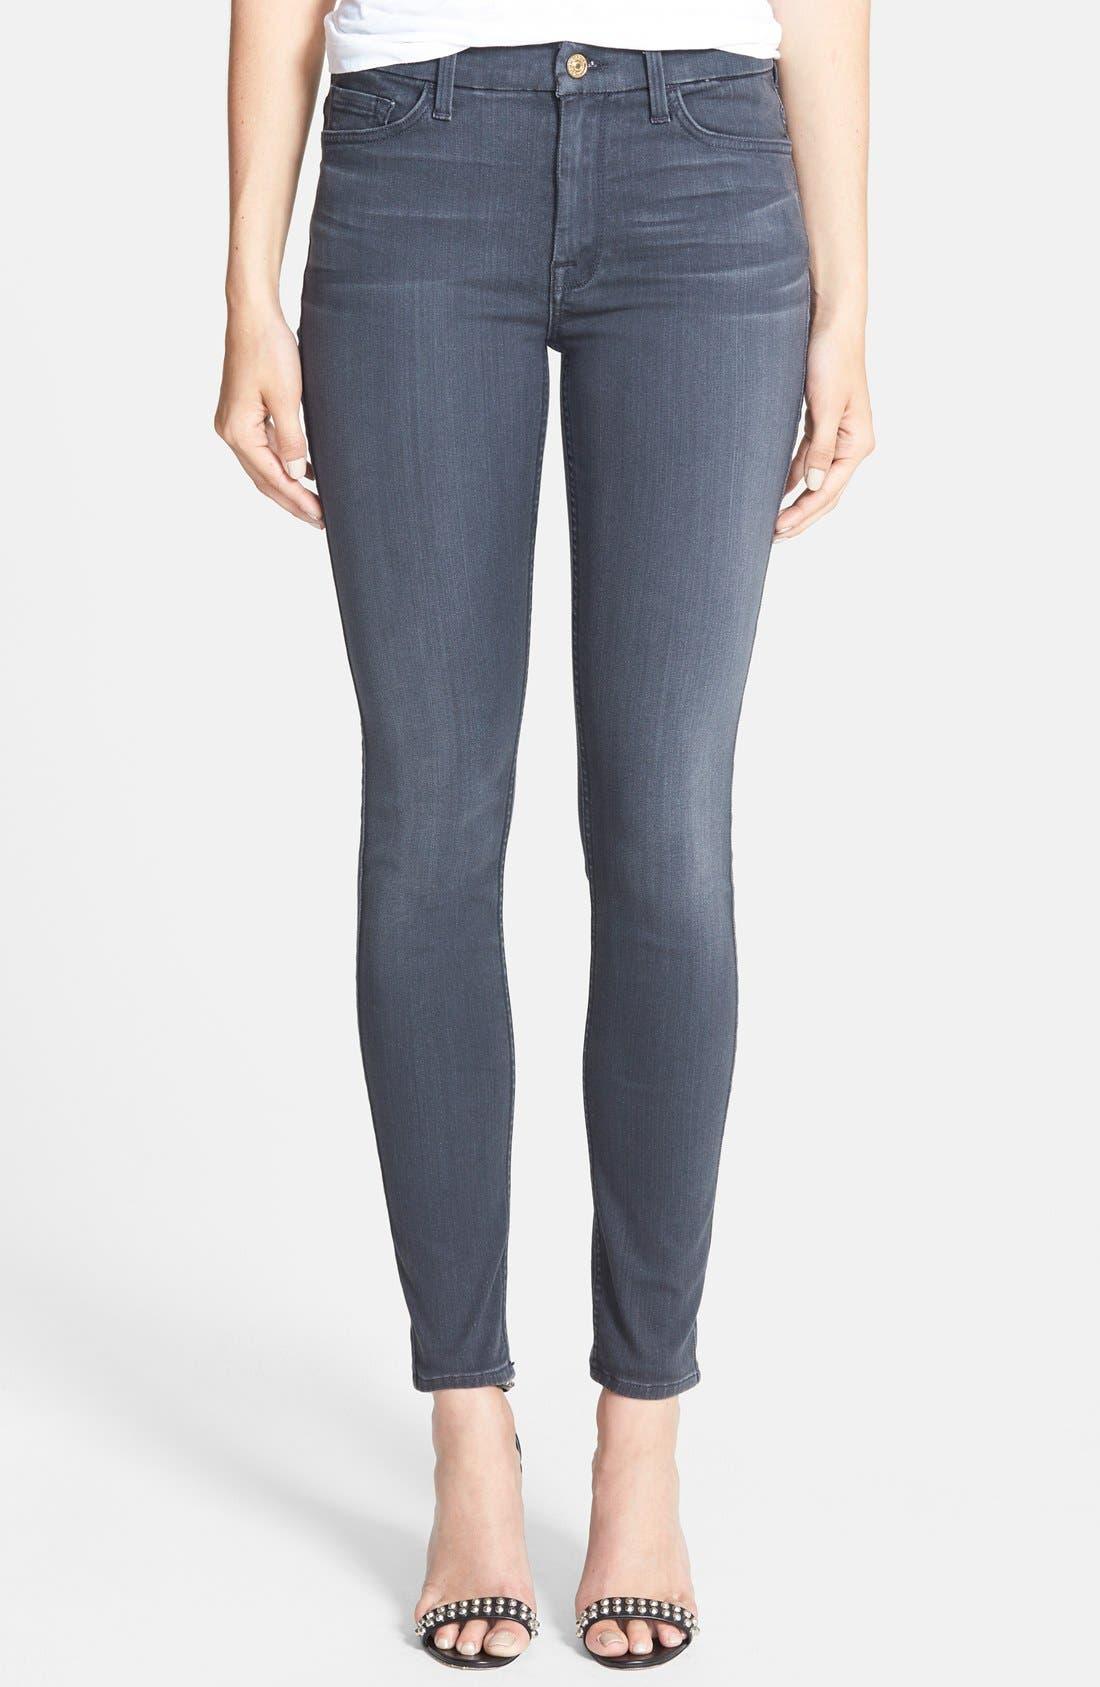 High Waist Ankle Skinny Jeans,                             Main thumbnail 1, color,                             BASTILLE GREY